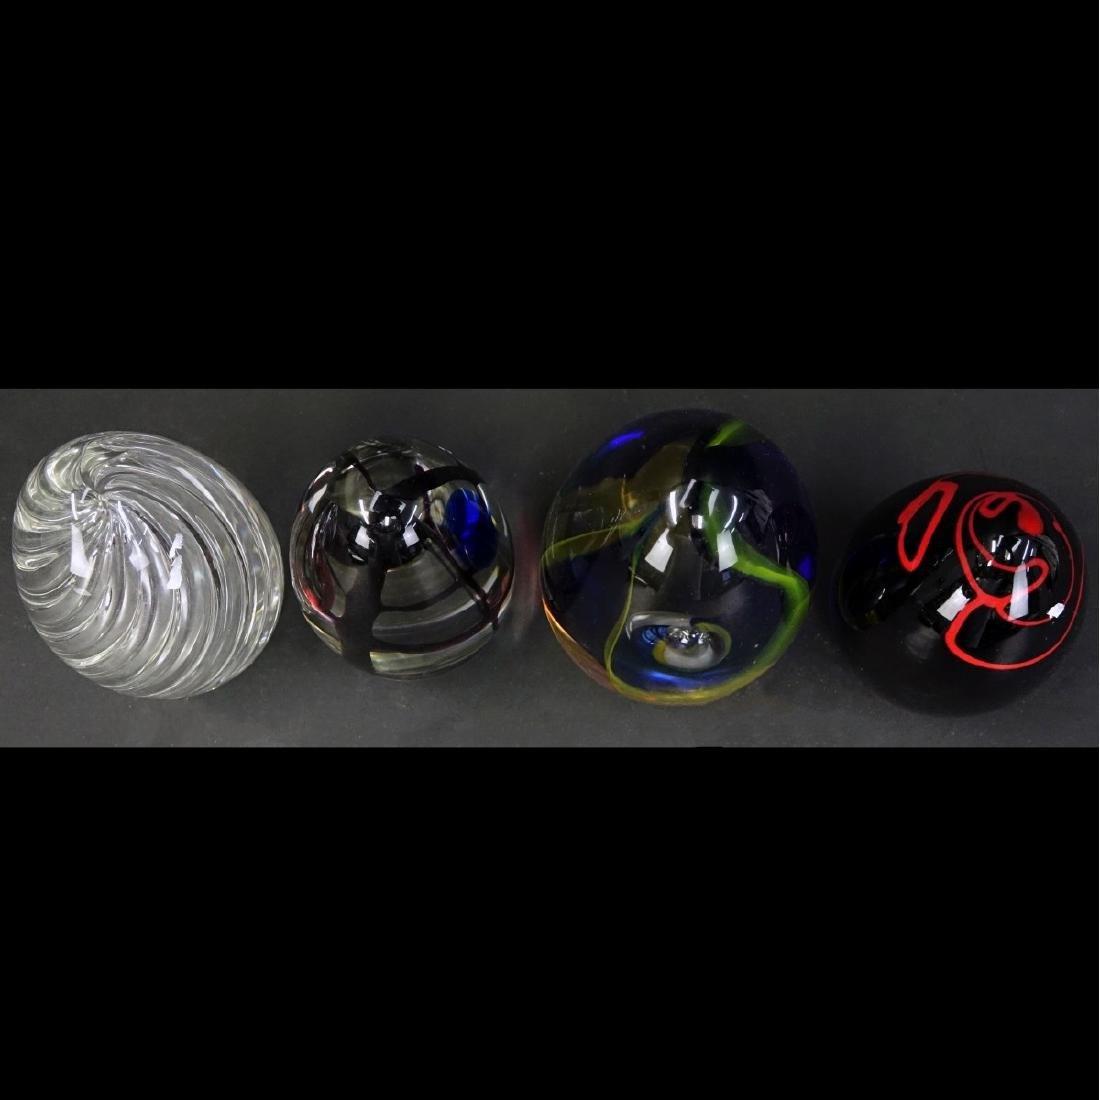 Four (4) Murano Seguso Art Glass Egg Paperweights - 2